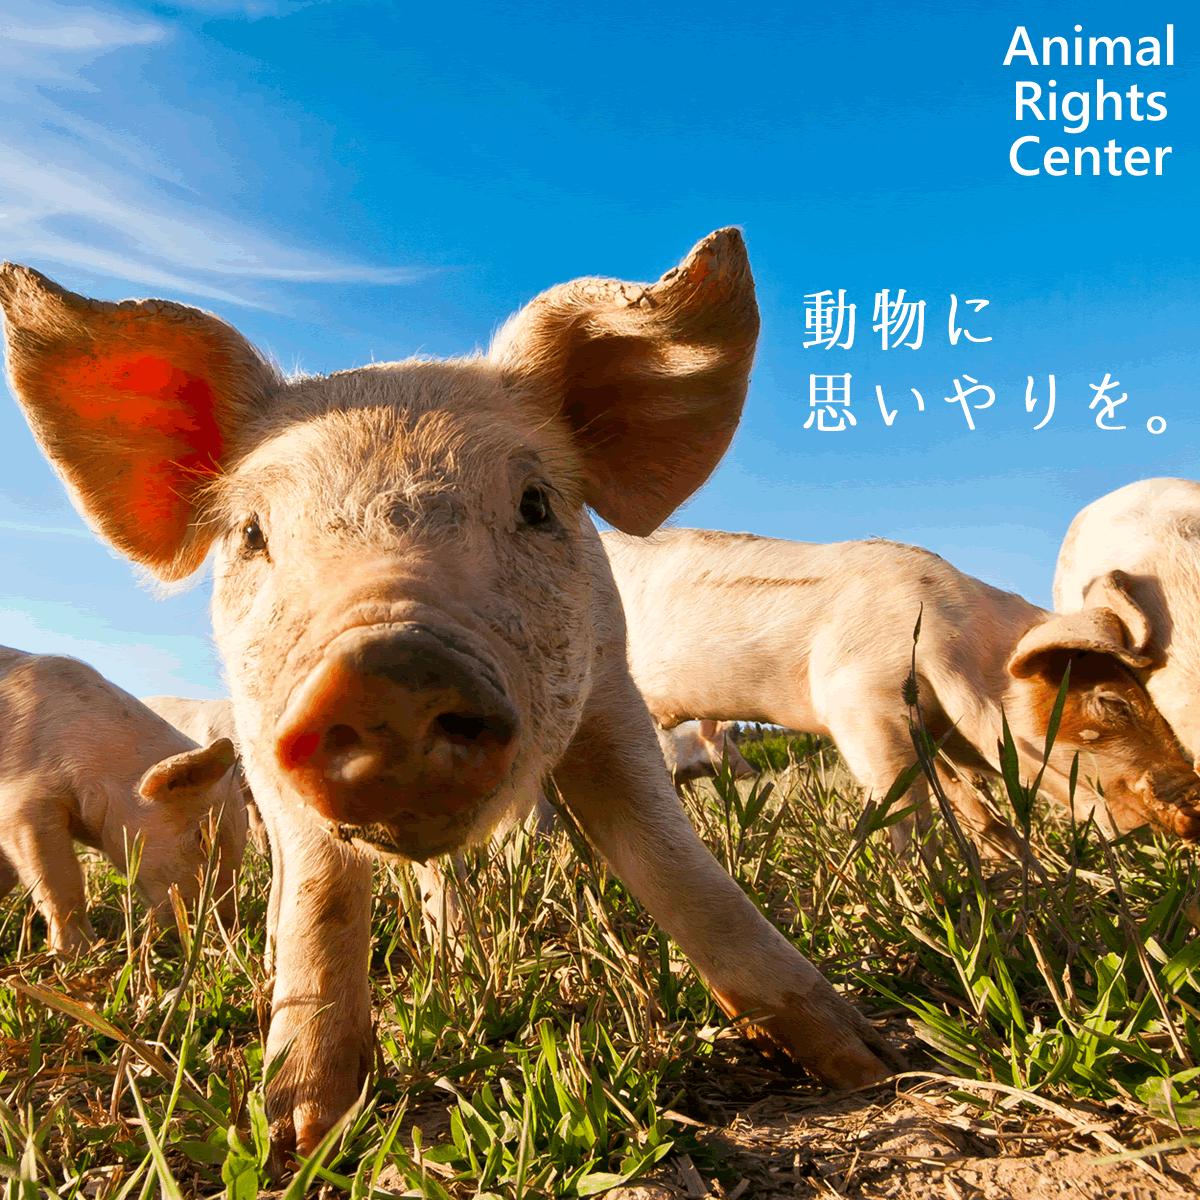 NPO法人アニマルライツセンター 毛皮、動物実験、工場畜産、犬猫等の虐待的飼育をなくしエシカルな社会へ